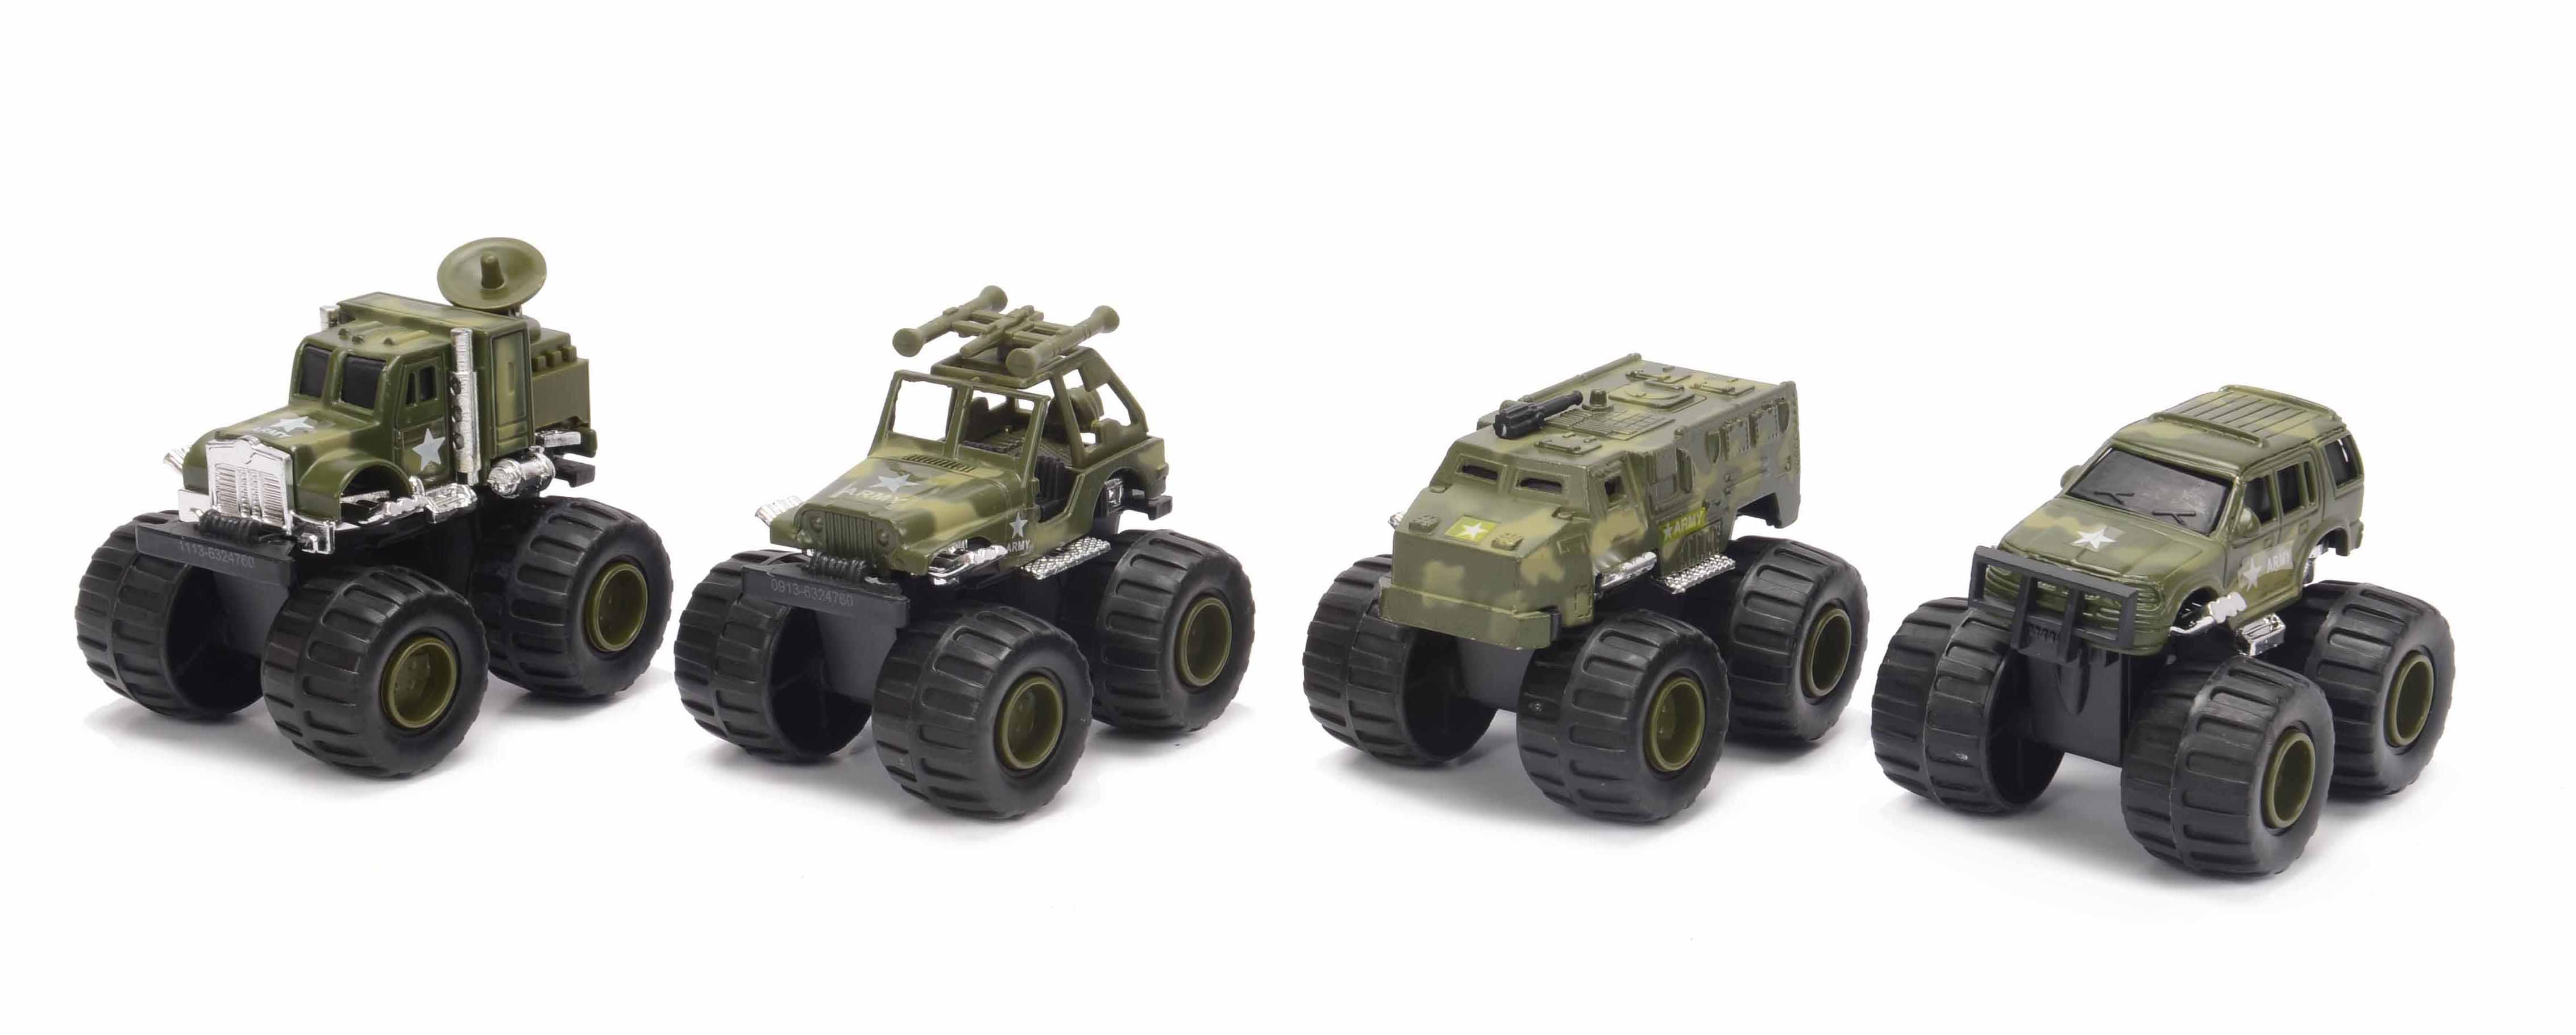 Танки и военная техника Soma 79978 танки и военная техника wincars набор машинок wincars автоперевозчик военная техника 1 70 в асс